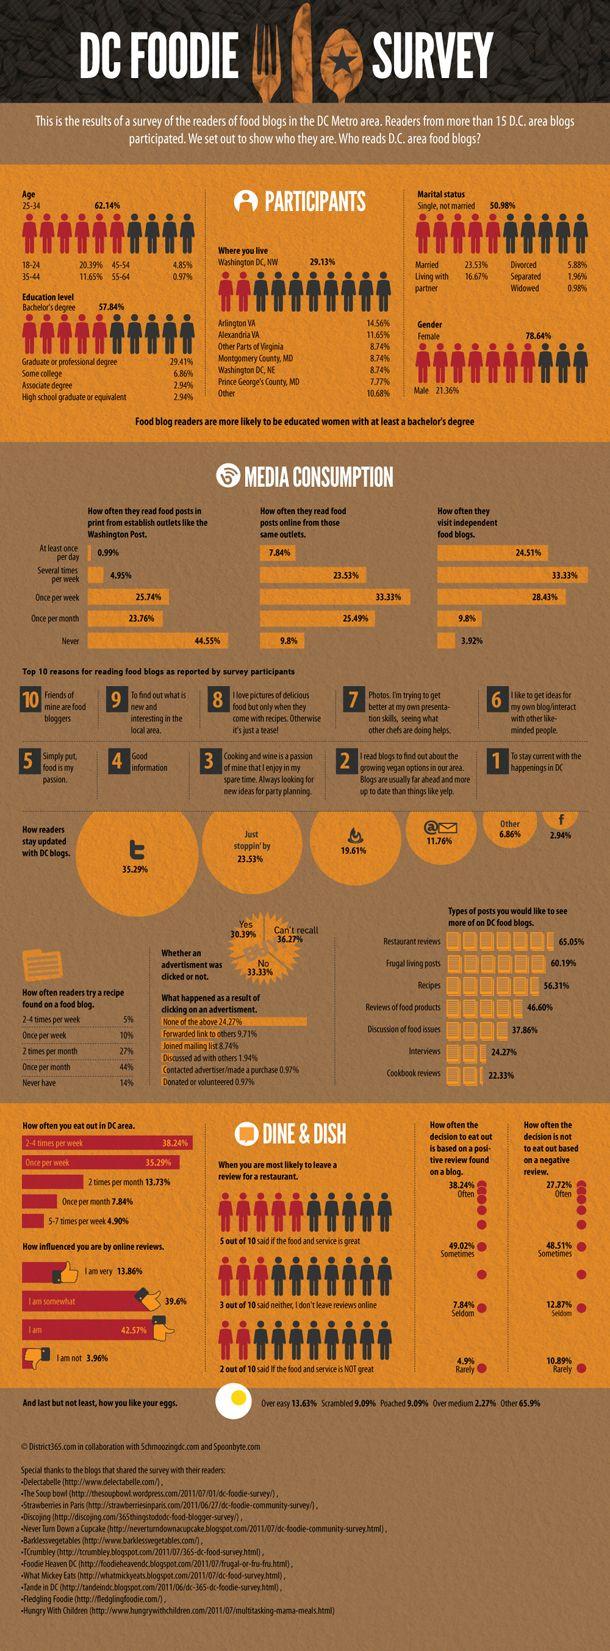 Food survey infographic